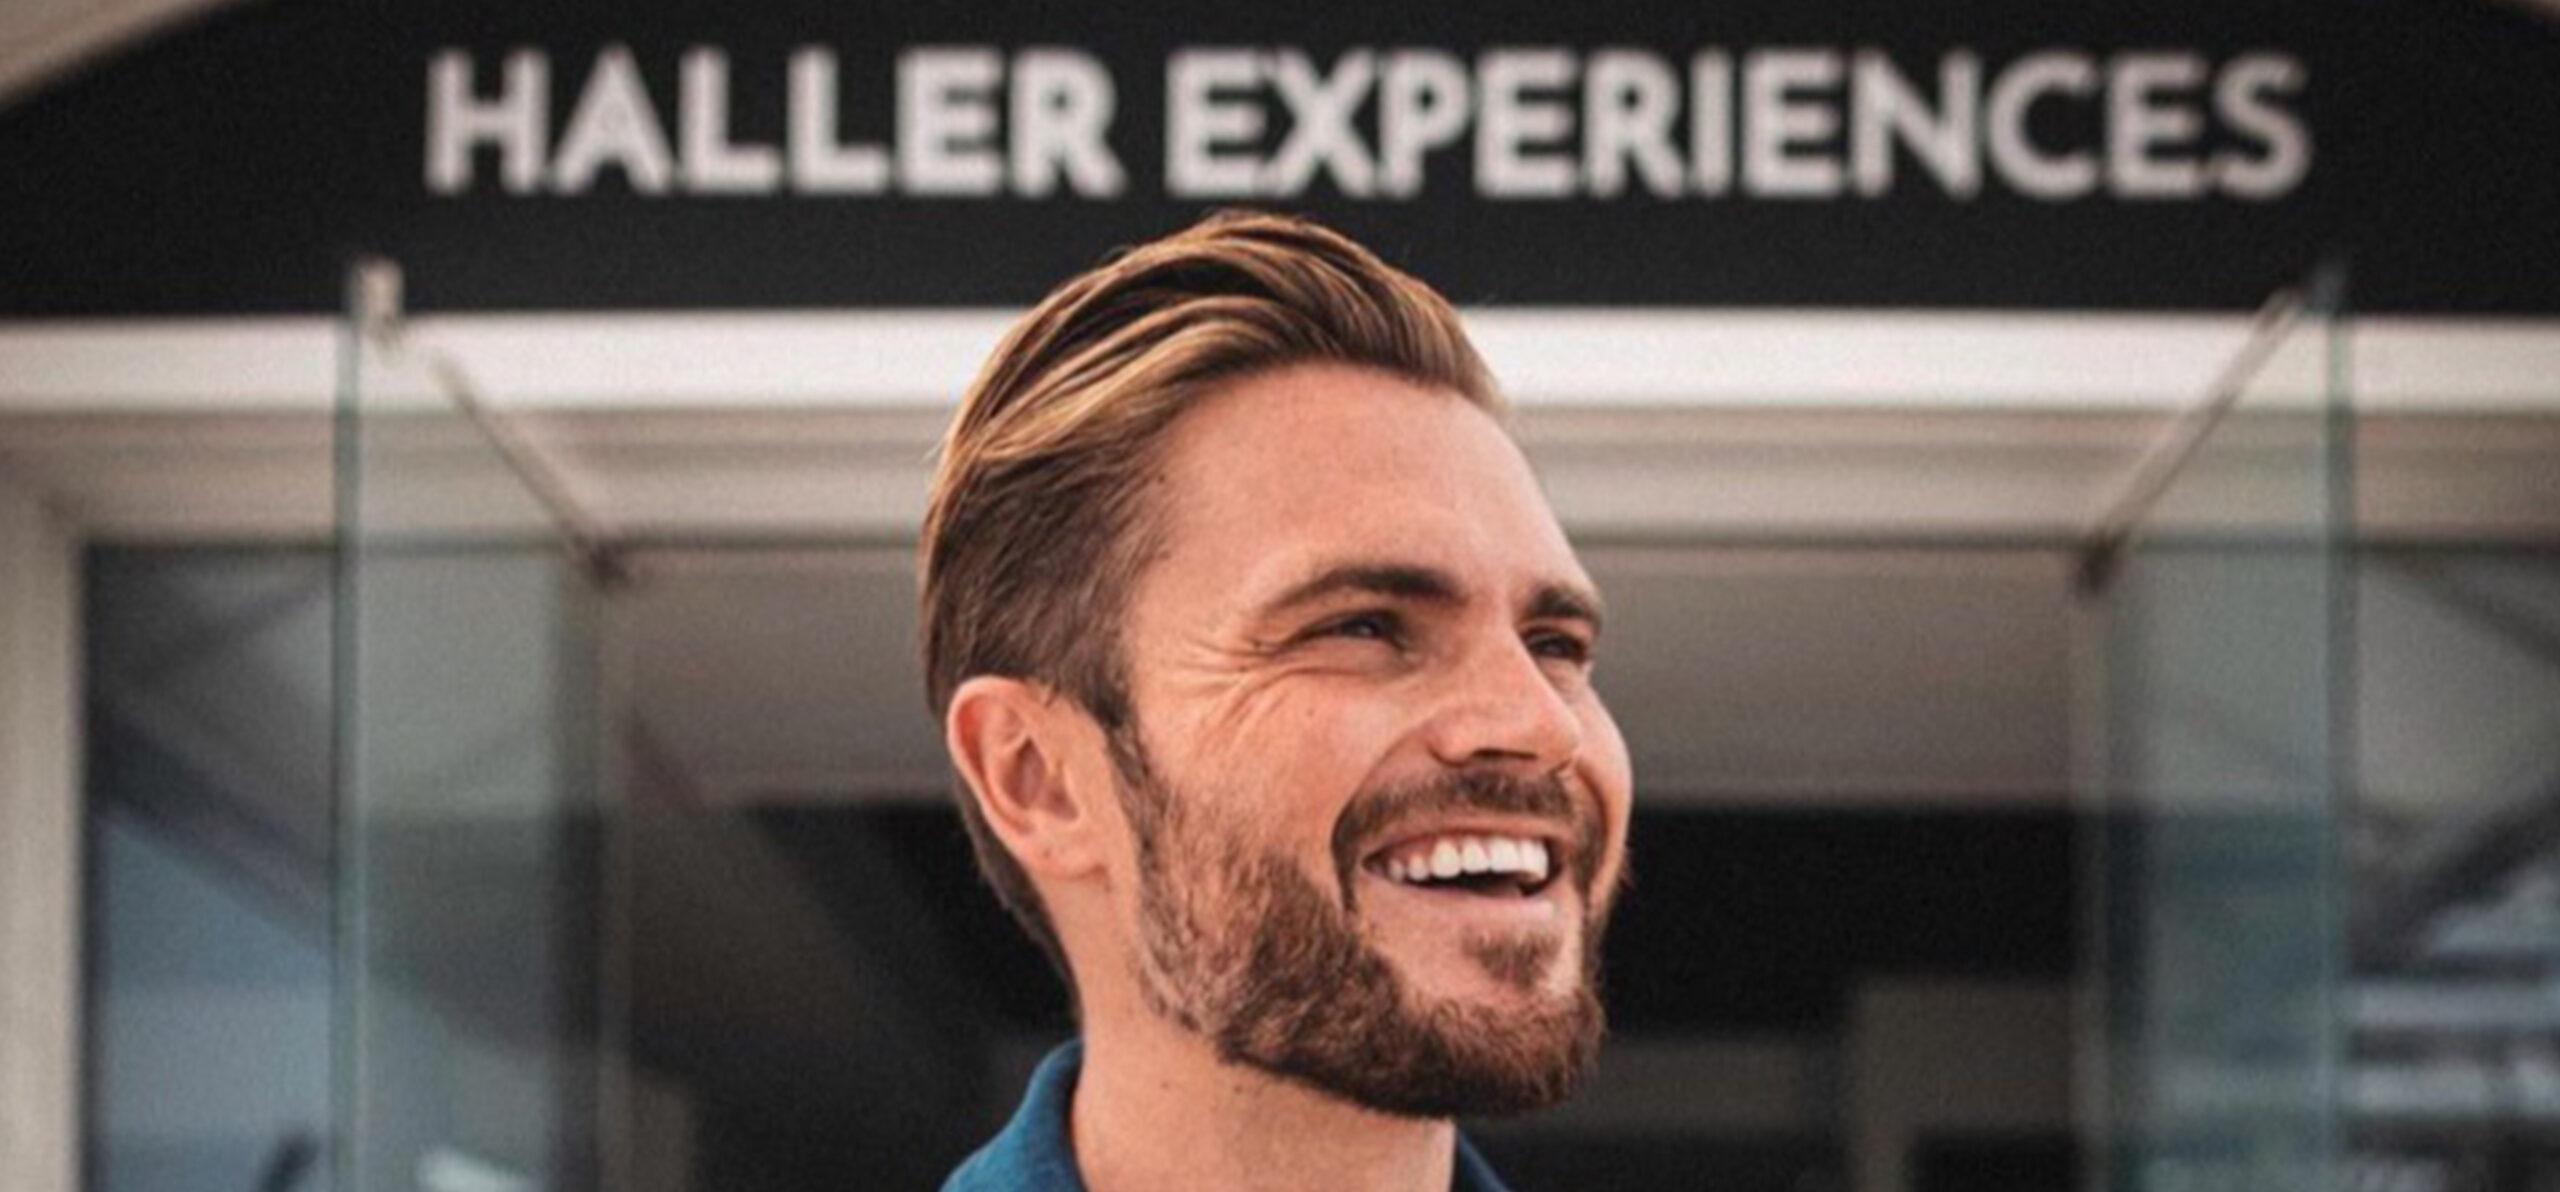 Johannes Haller - Haller Experiences